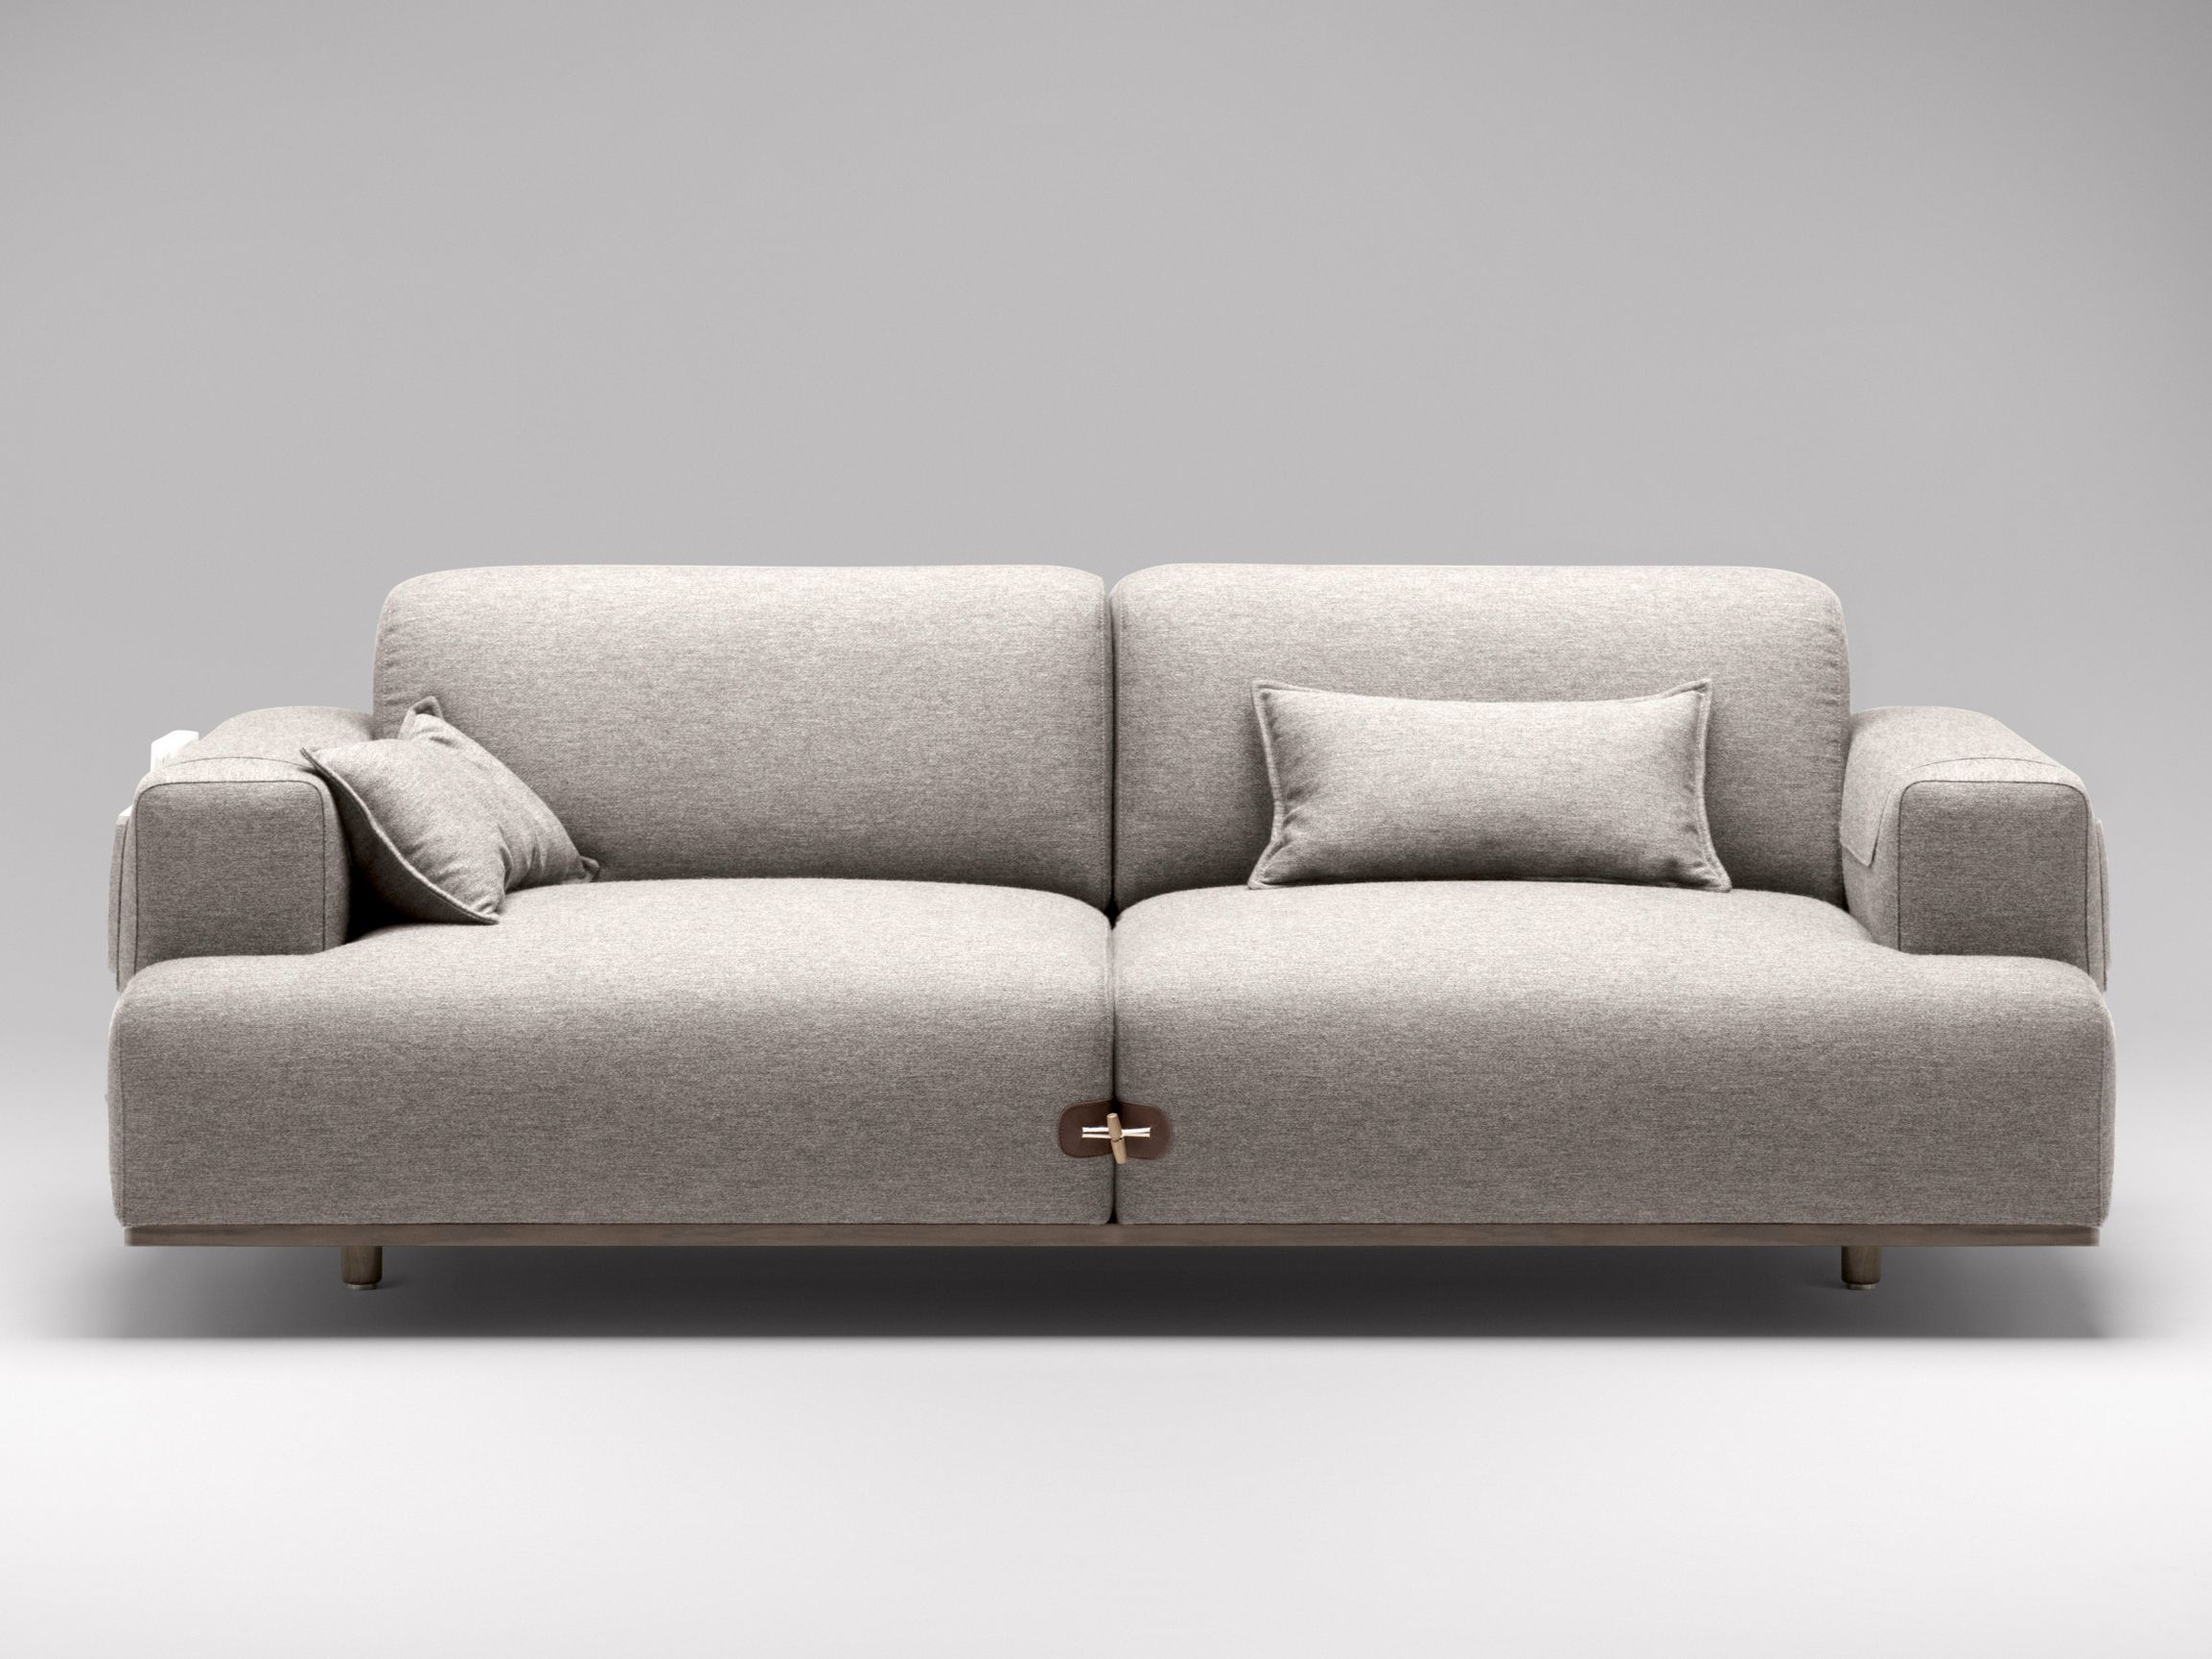 Fabric Sofa Set Designs In Kenya Beds Sydney 2 Seater Eden Next Day